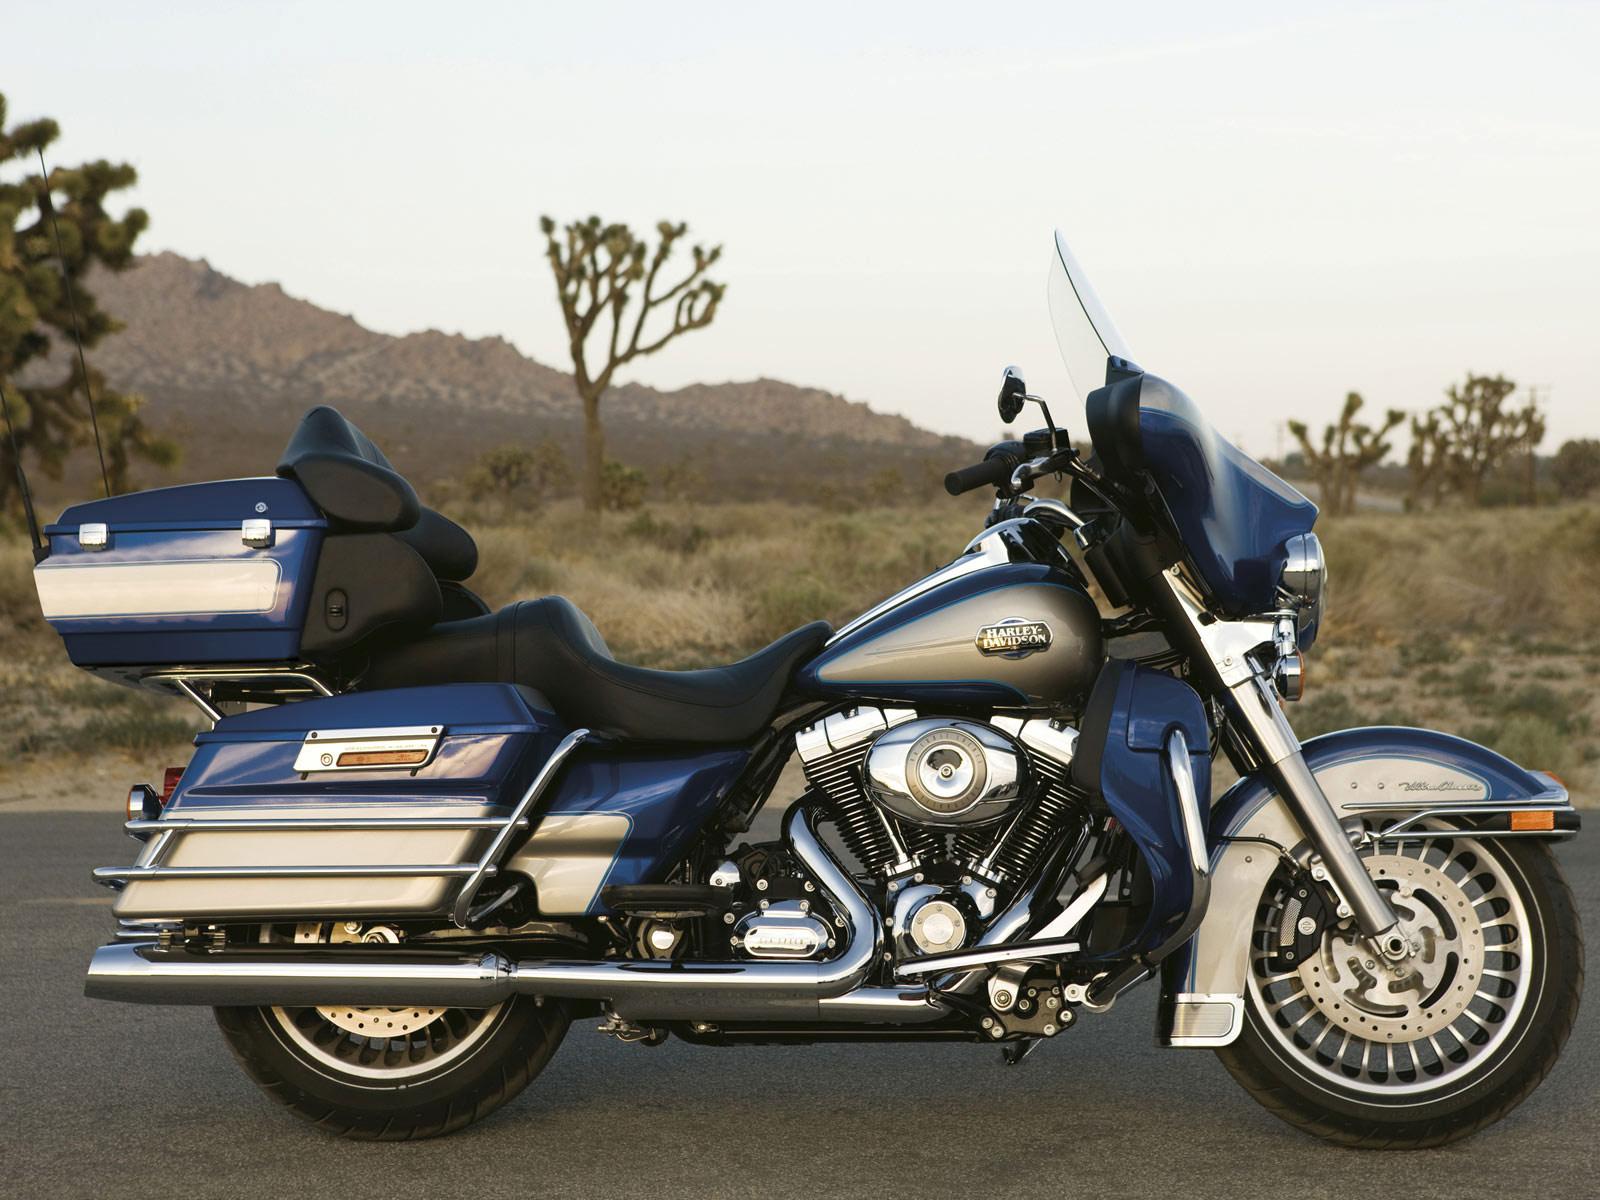 Harley Davidson Electra Glide Ultra Classic Specs